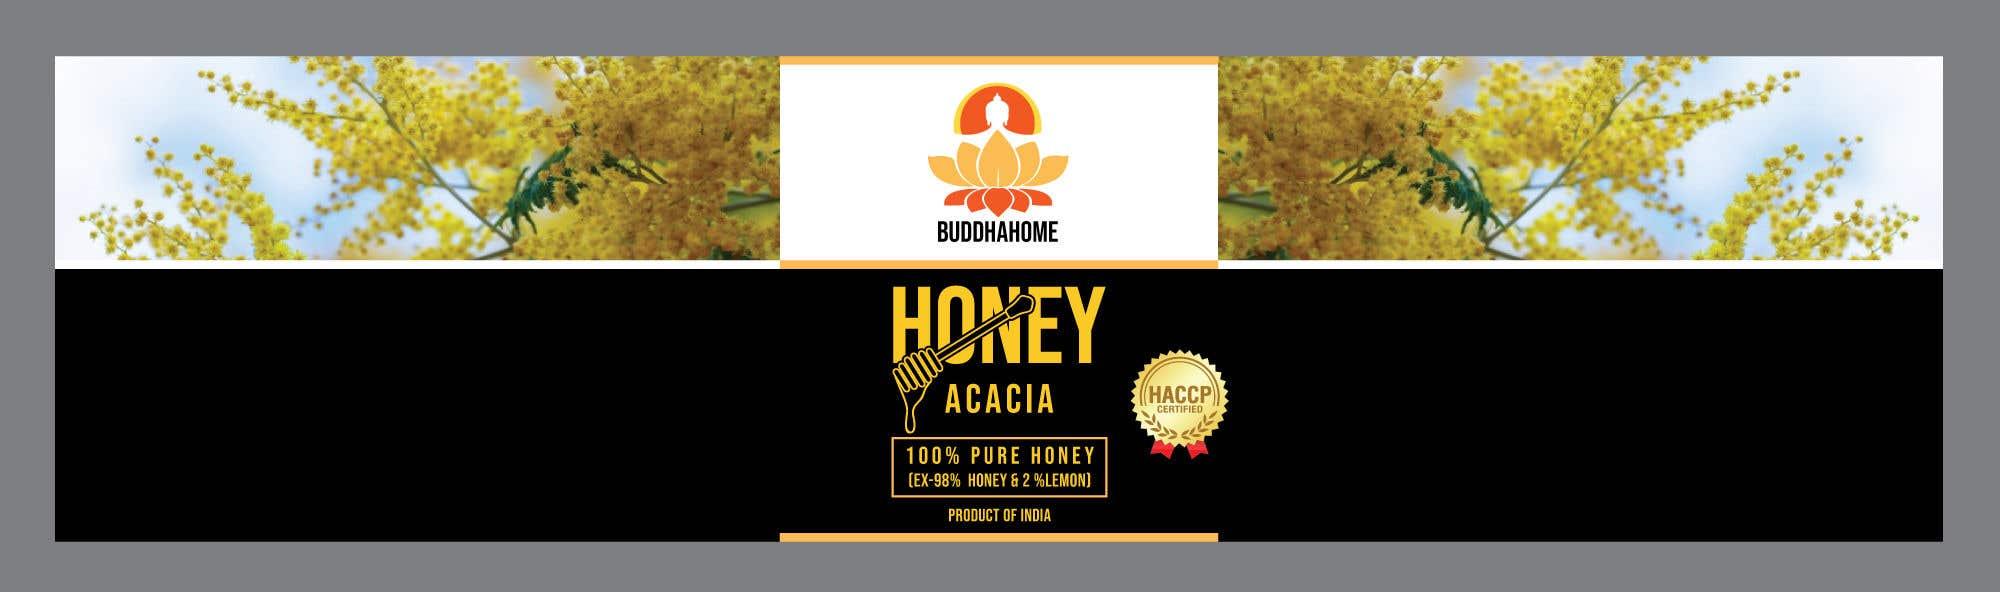 Kilpailutyö #                                        106                                      kilpailussa                                         Honey Label Designing Contest